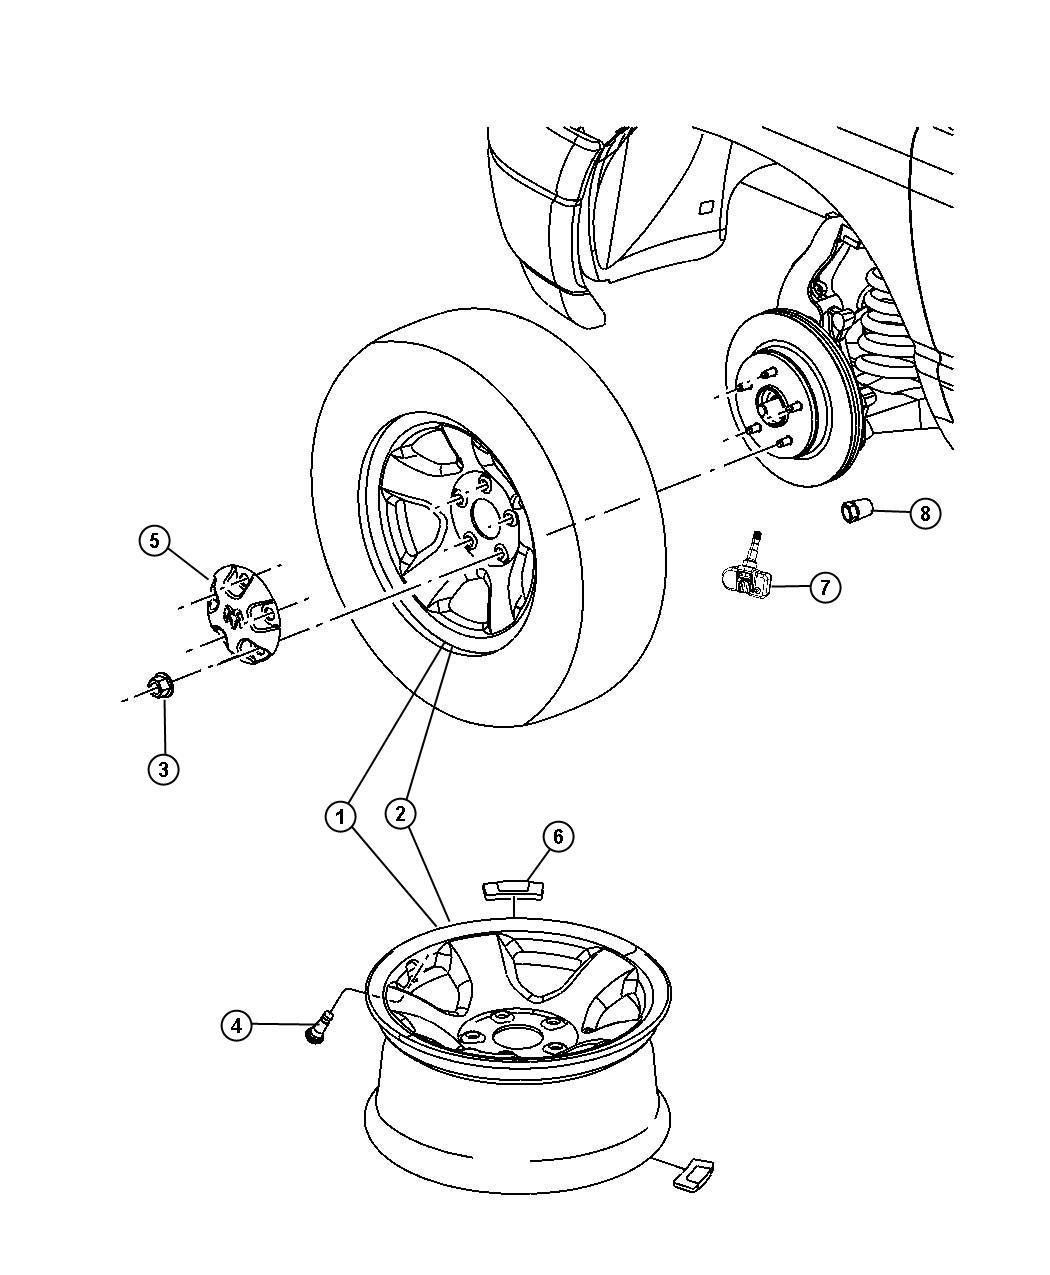 Dodge Ram 1500 Module. Tire pressure monitoring. Front